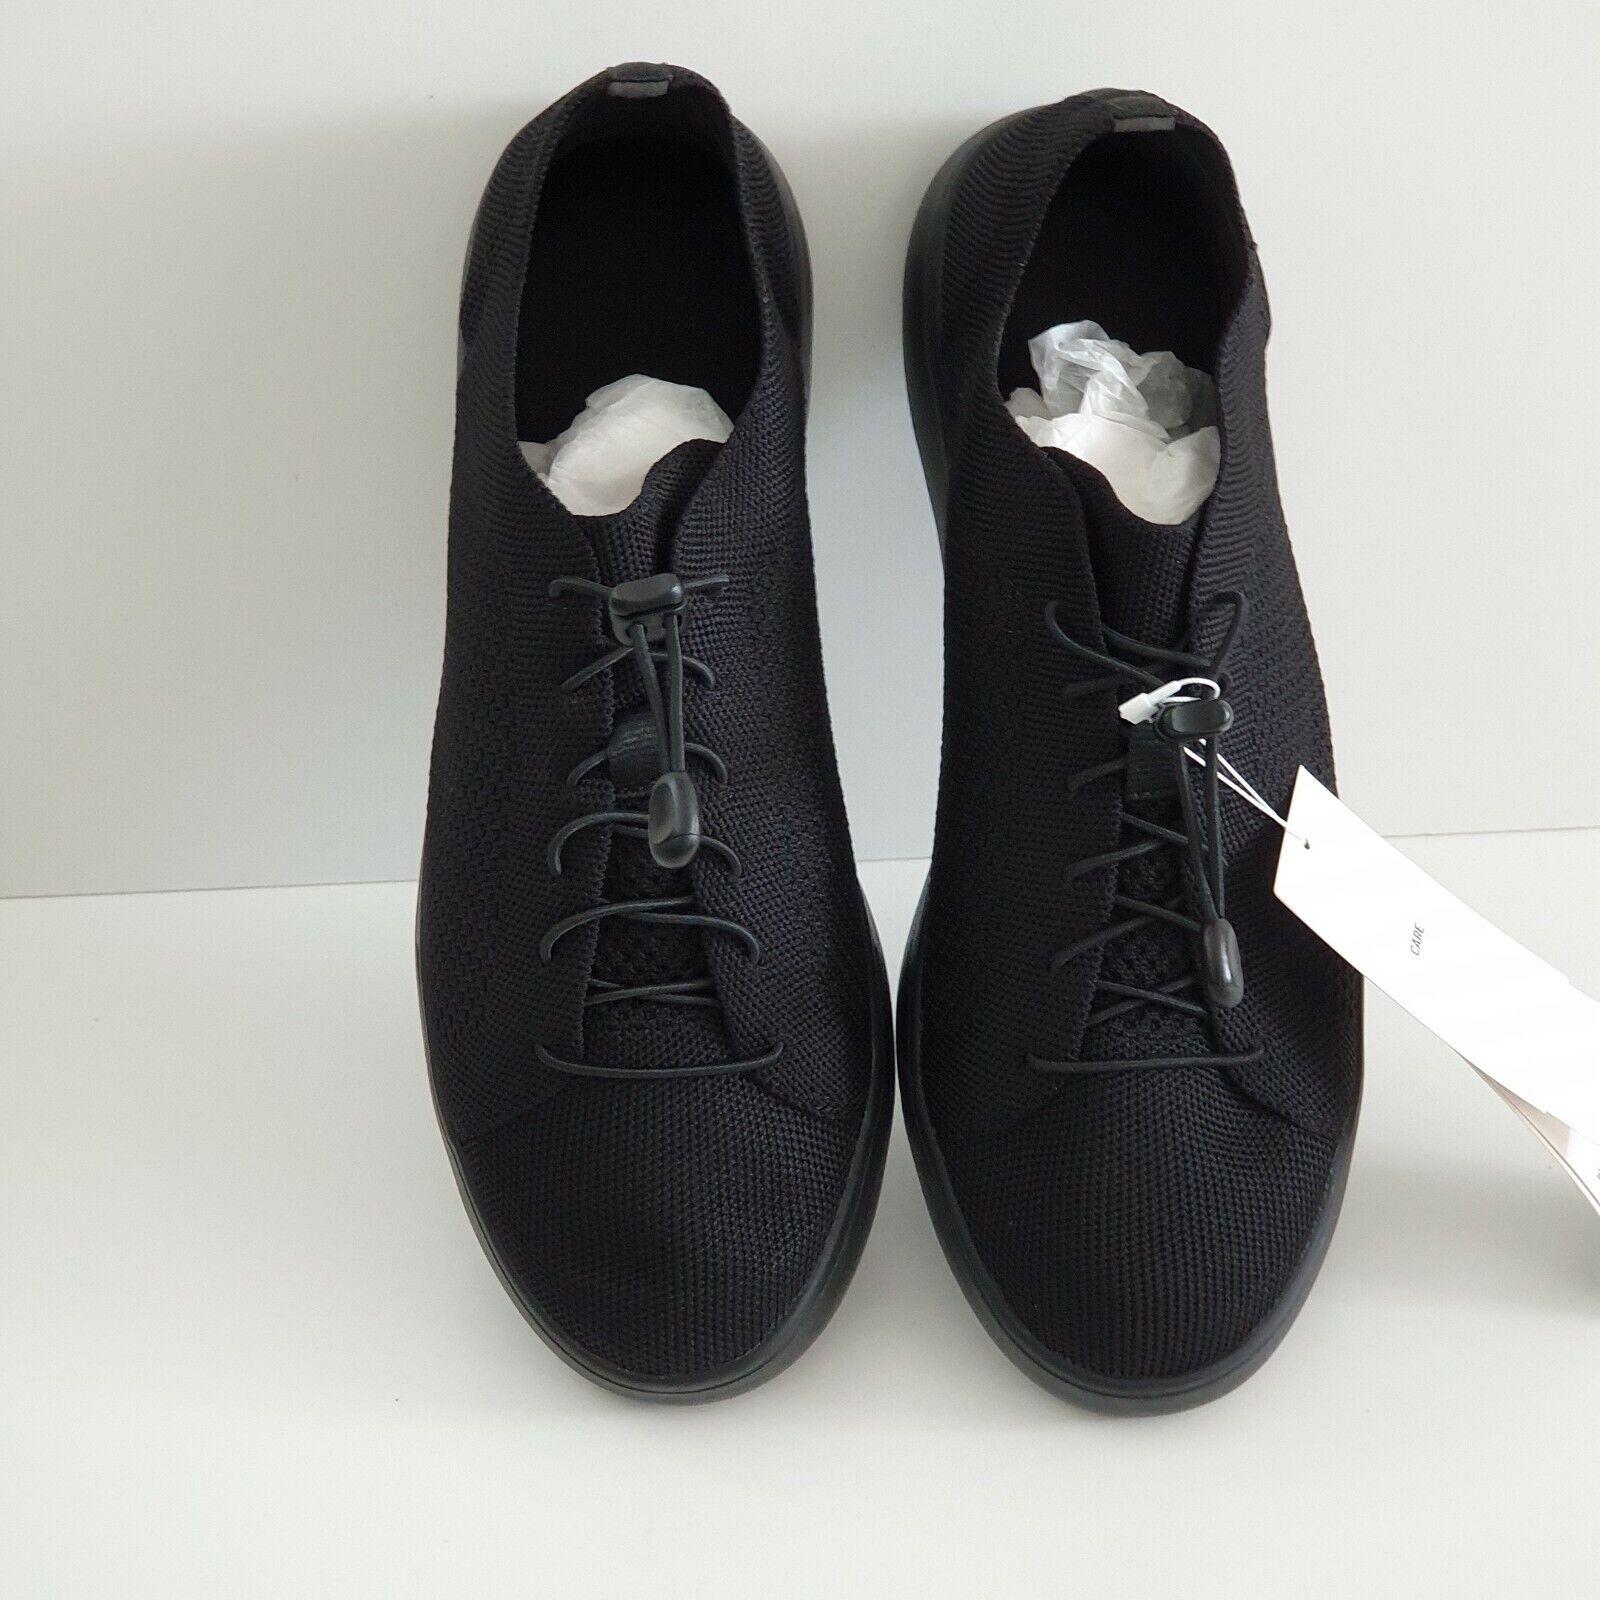 Uniqlo Knit Mesh Light Trainers Shoe Black Men UK 8